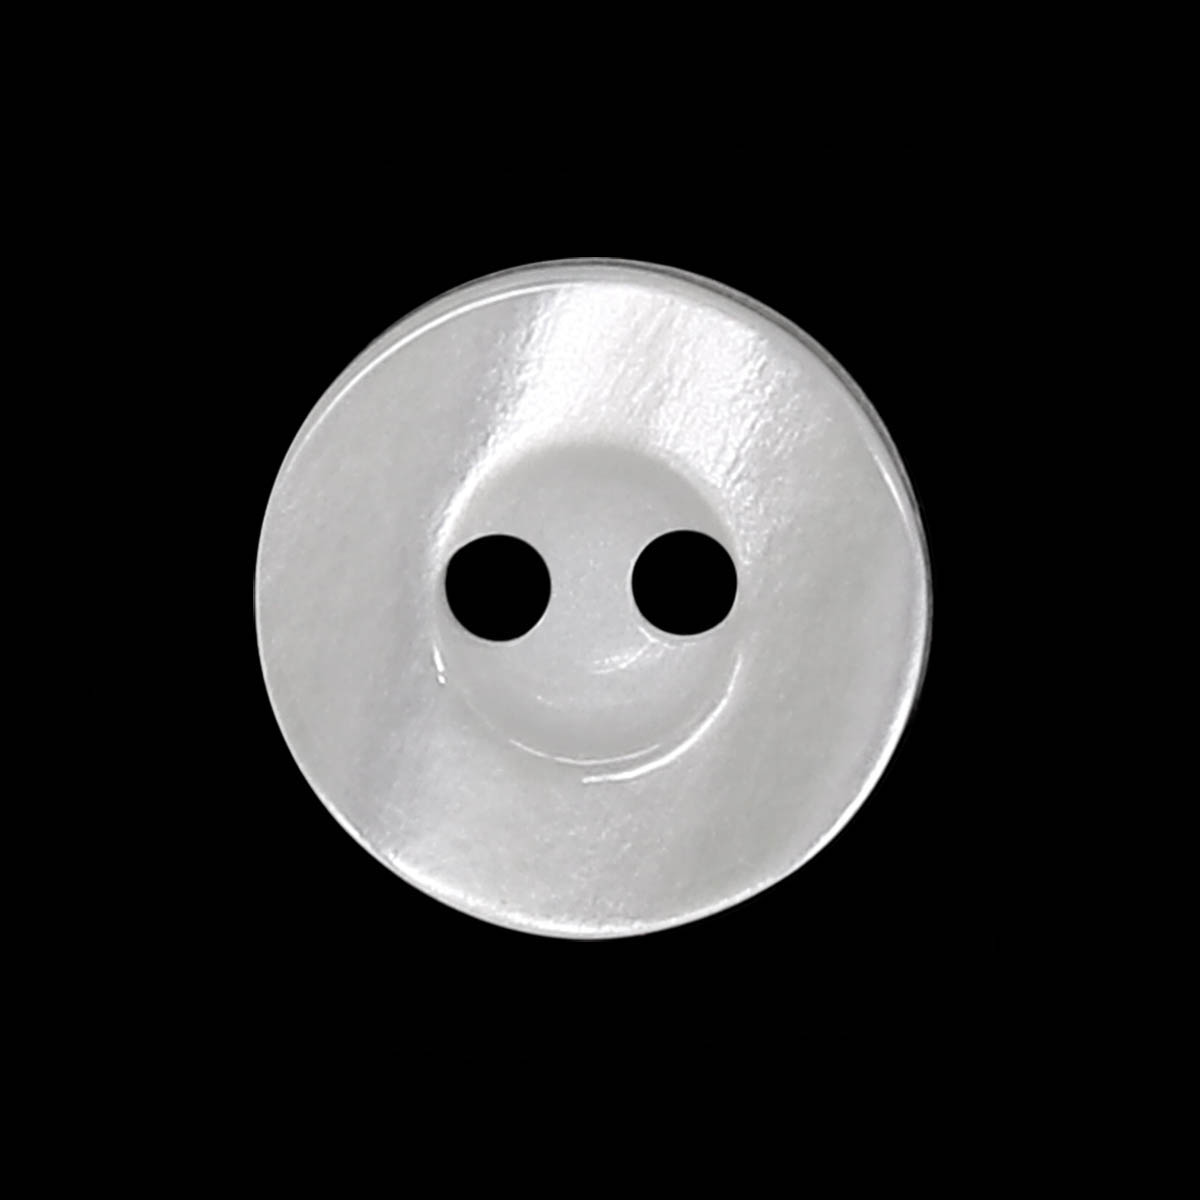 351225/2 20 (3512) Пуговица 2прокола бел.глянц.полиэстер ГР